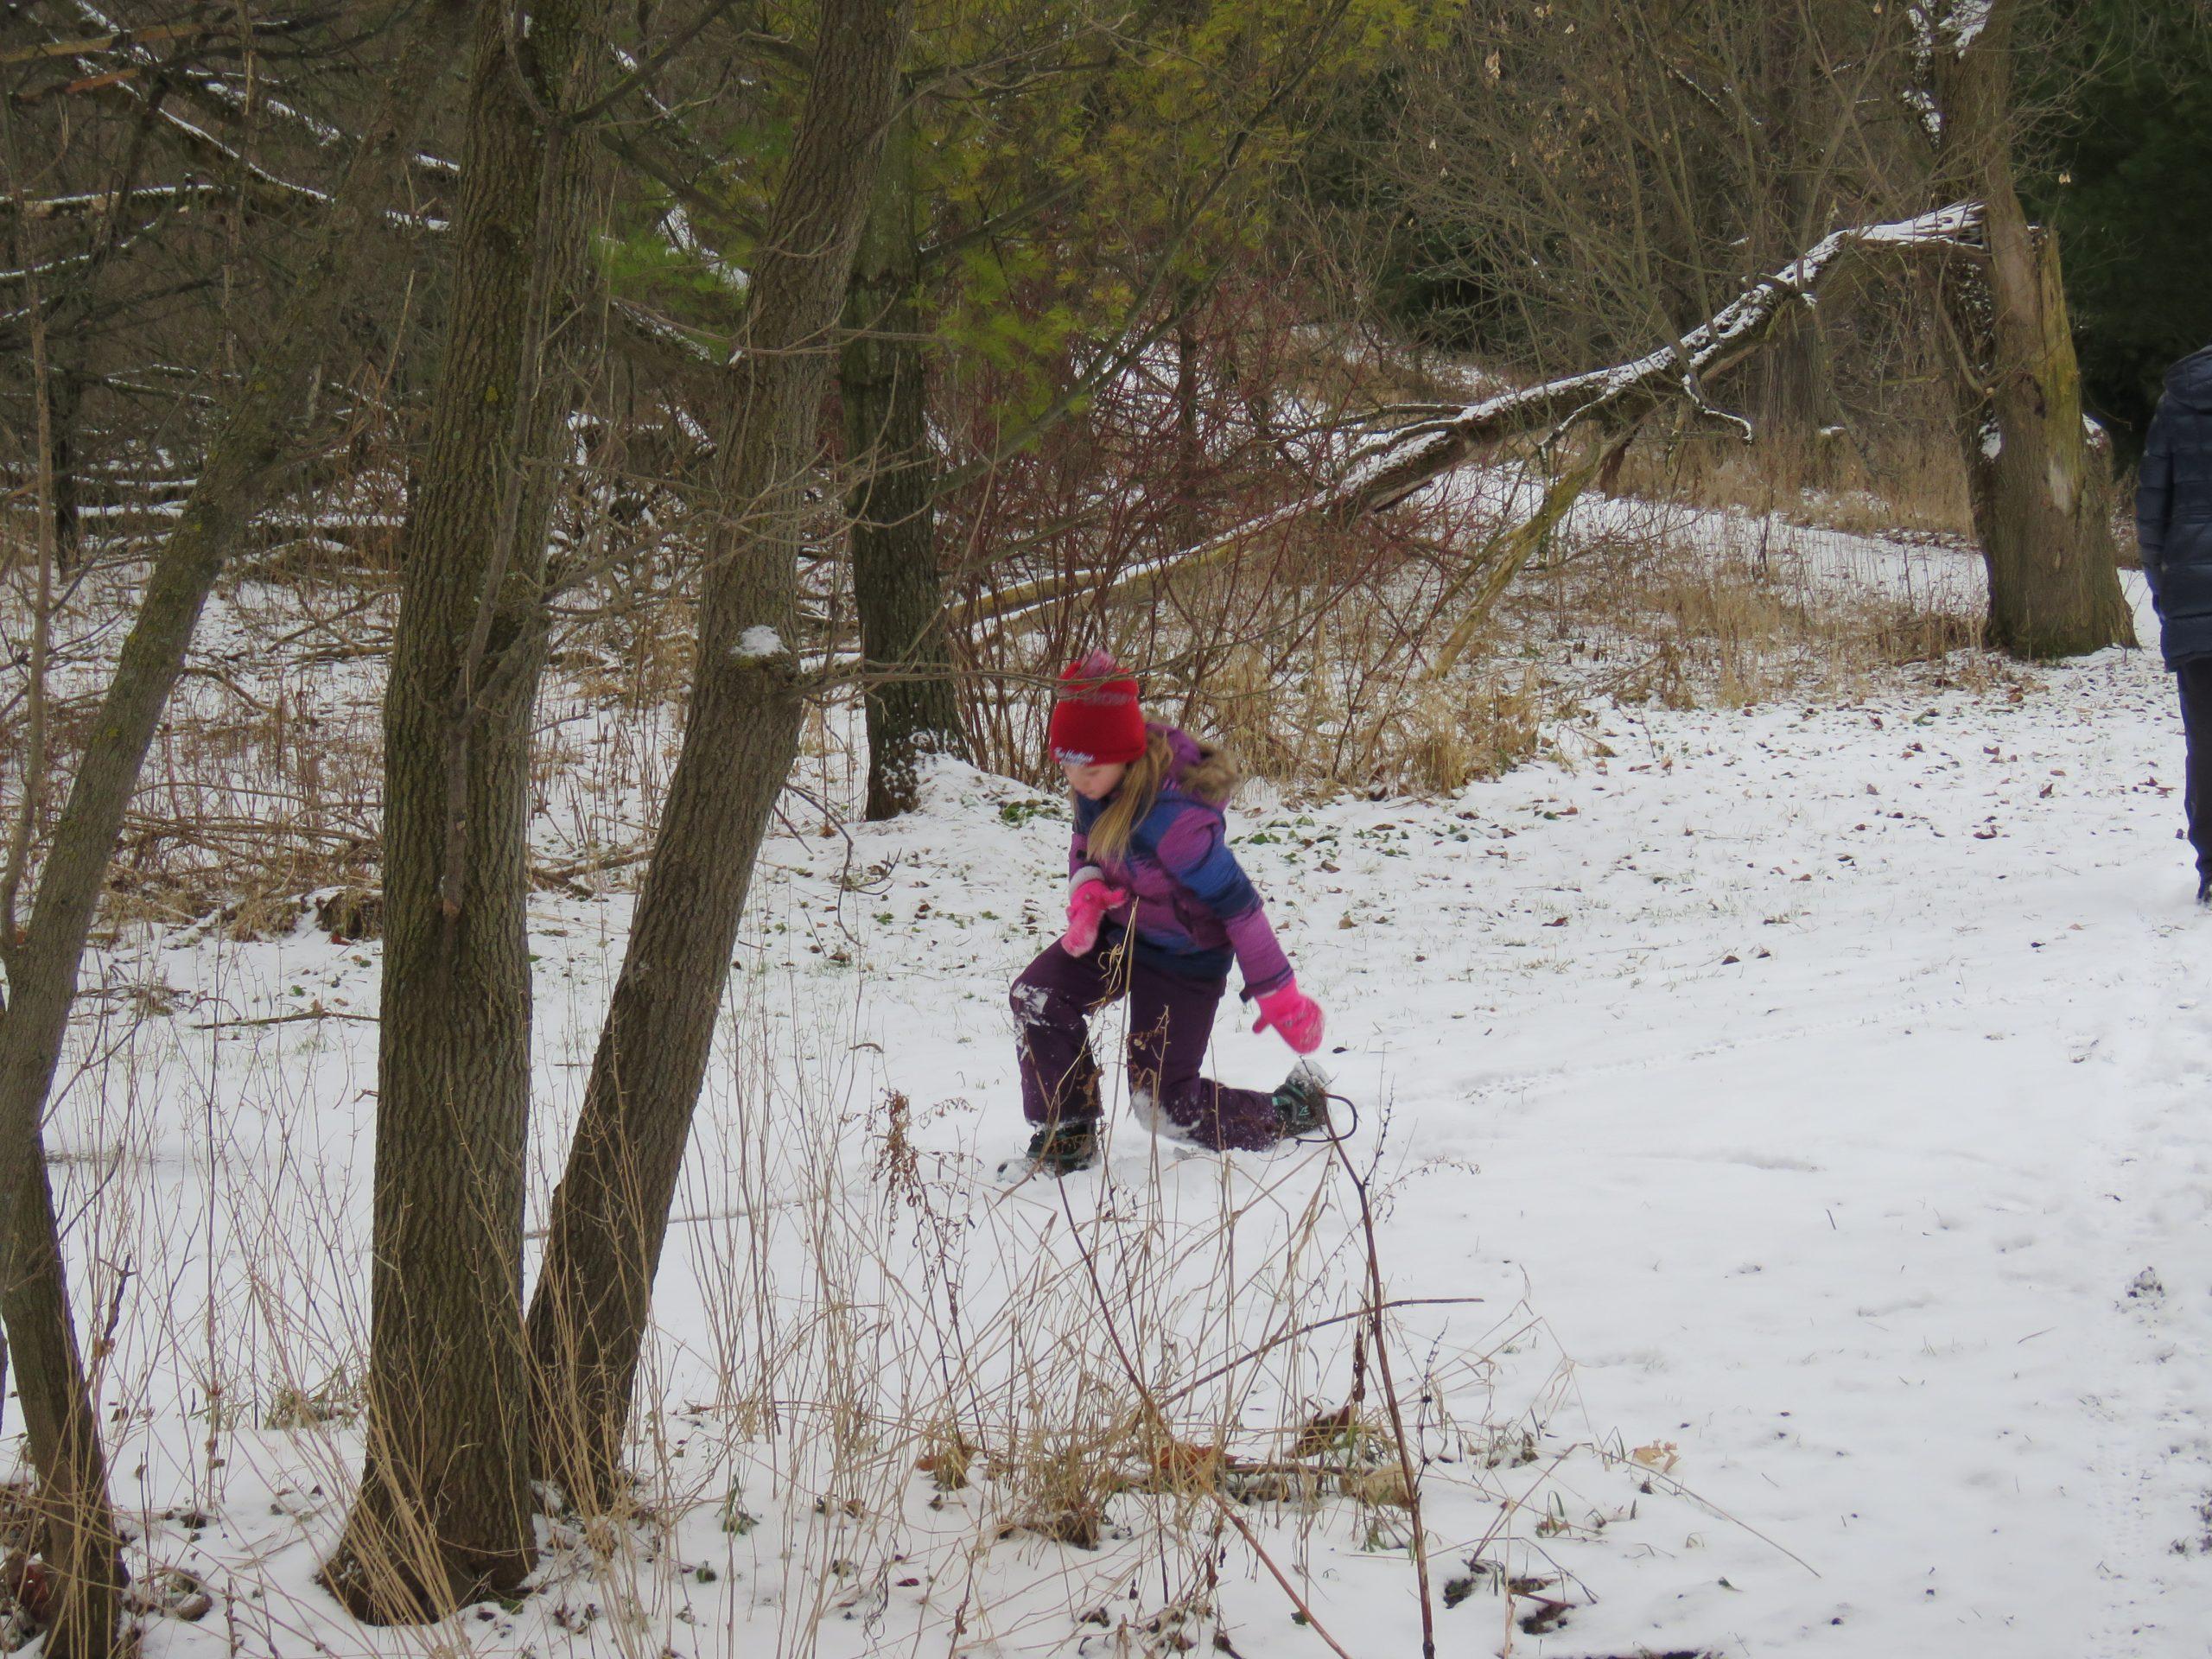 Snow is always fun